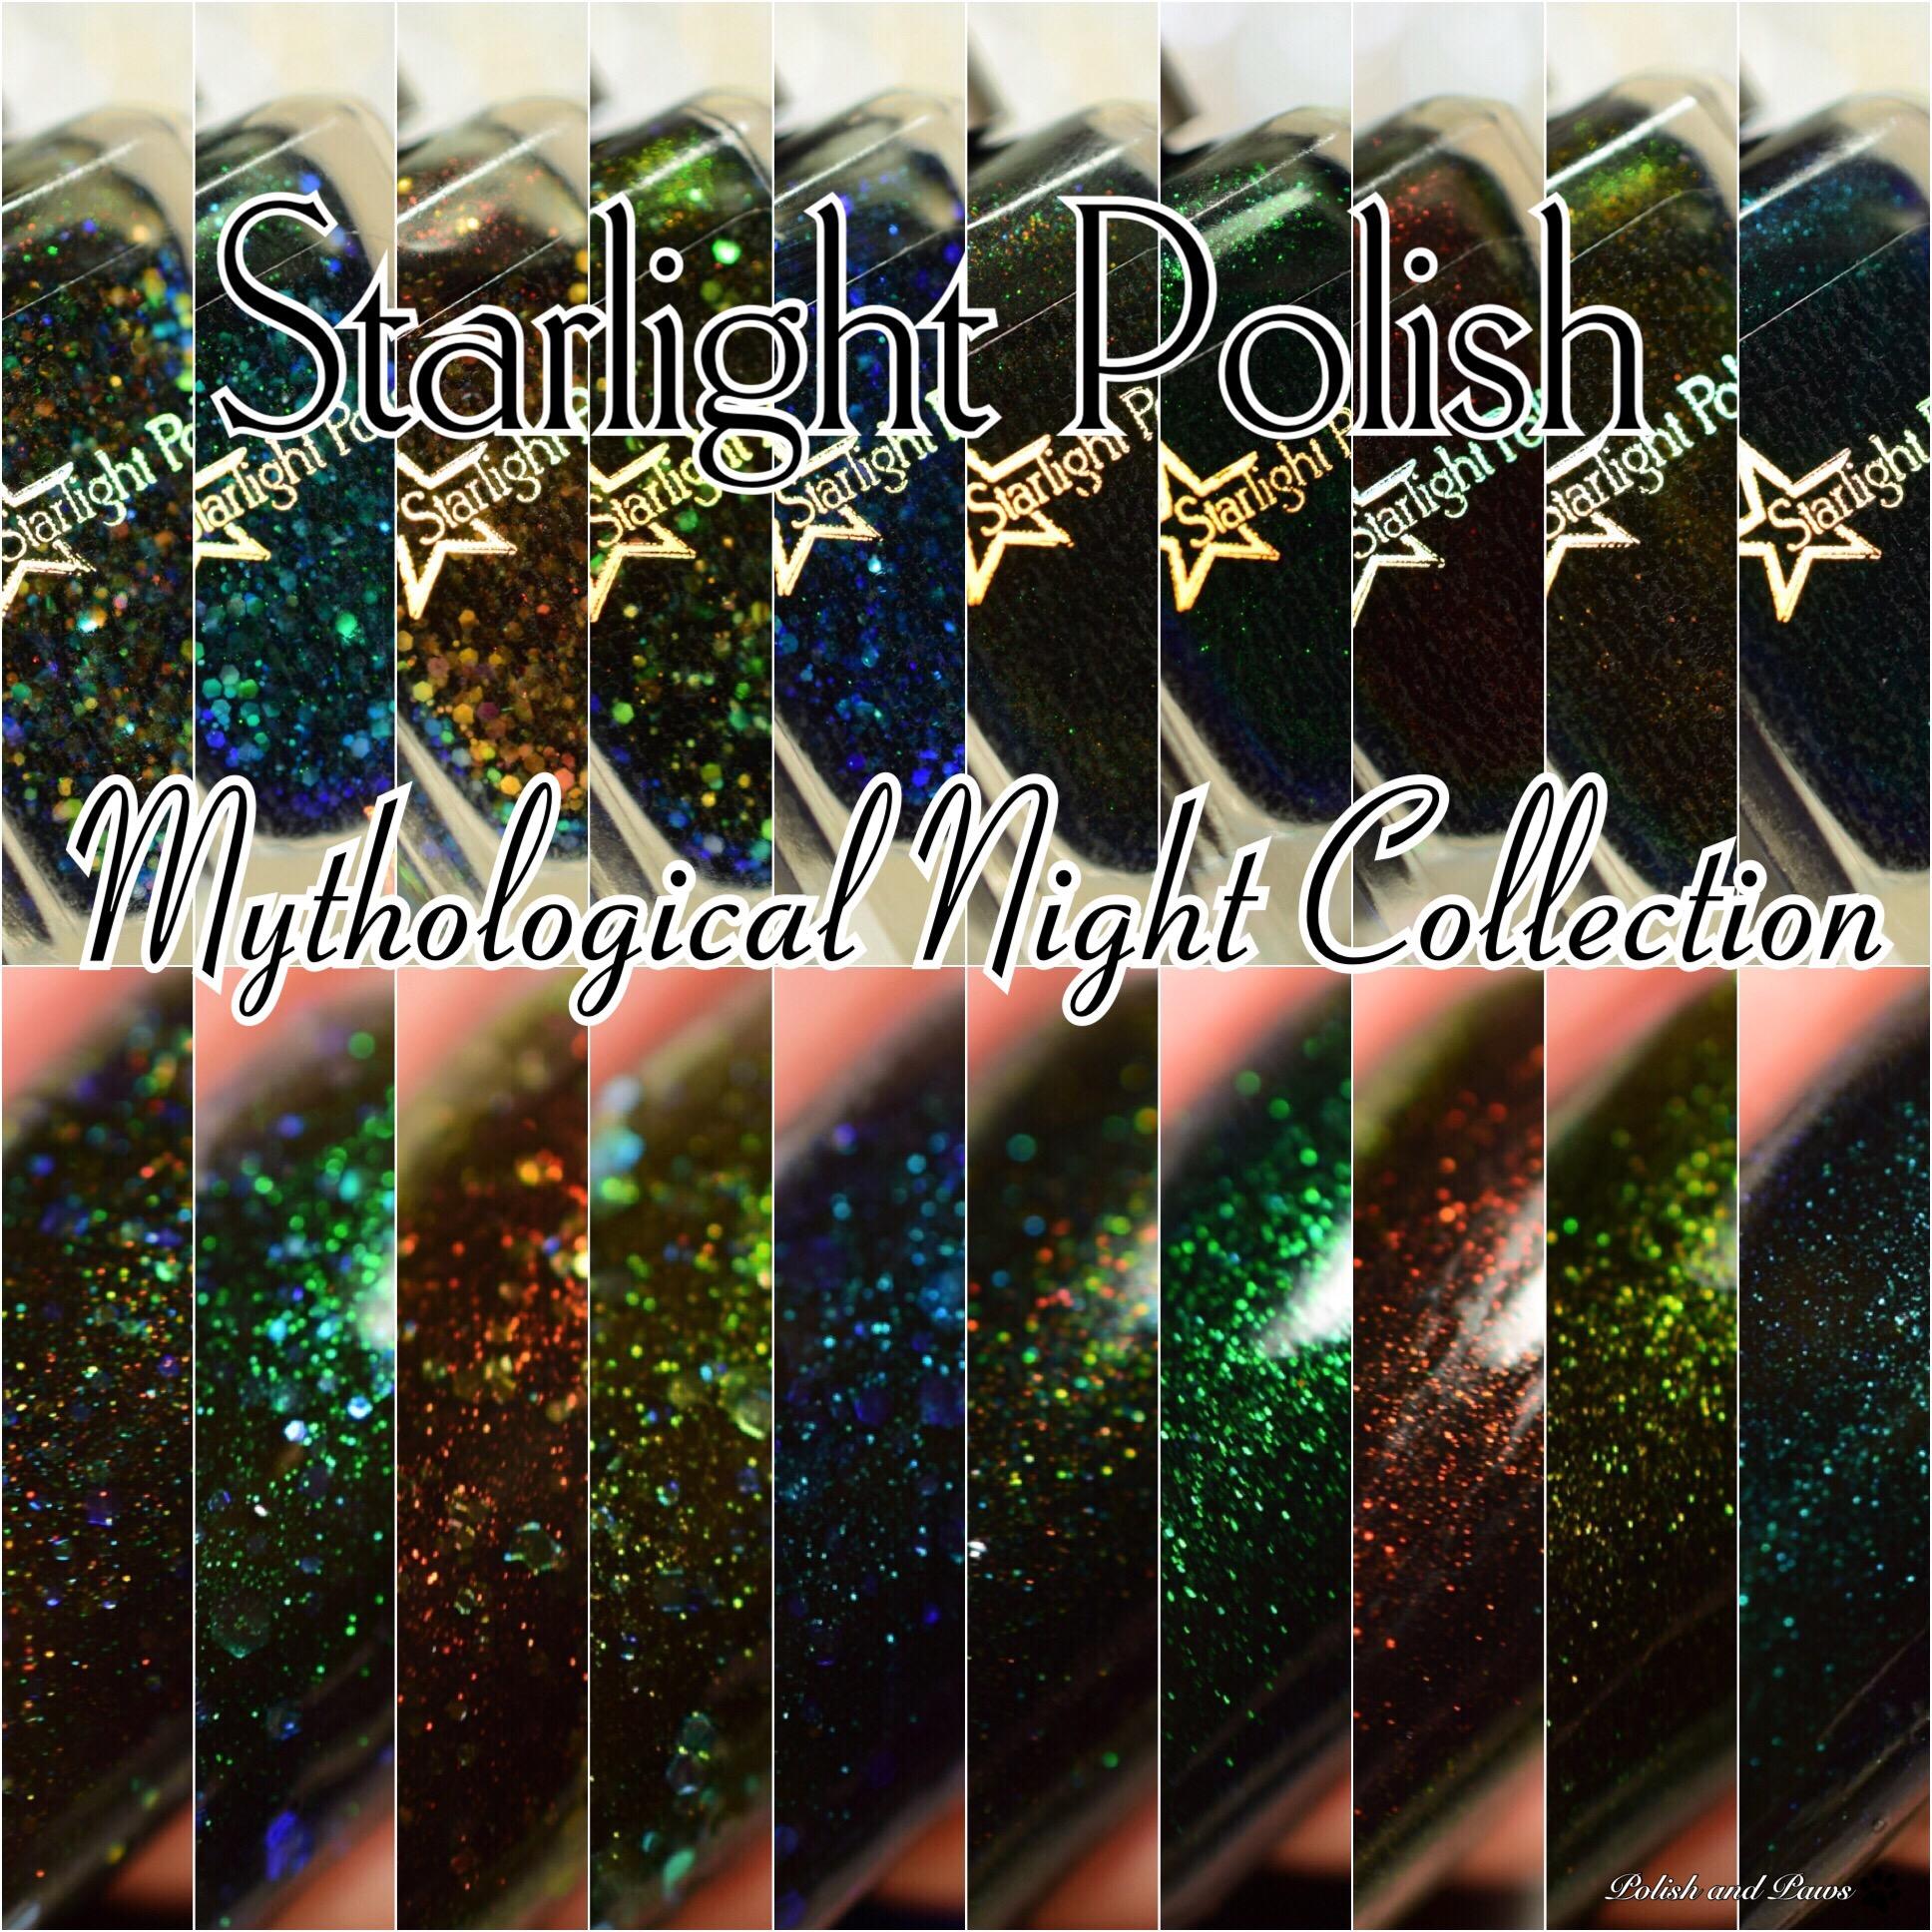 Starlight Polish Mythological Night Collection